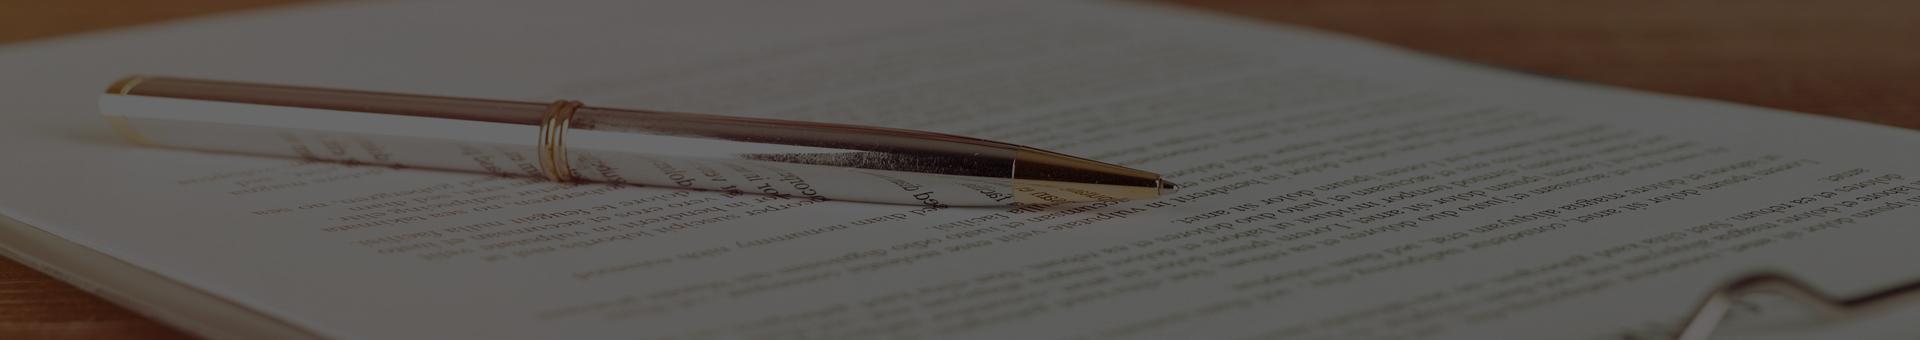 długopis i dokument